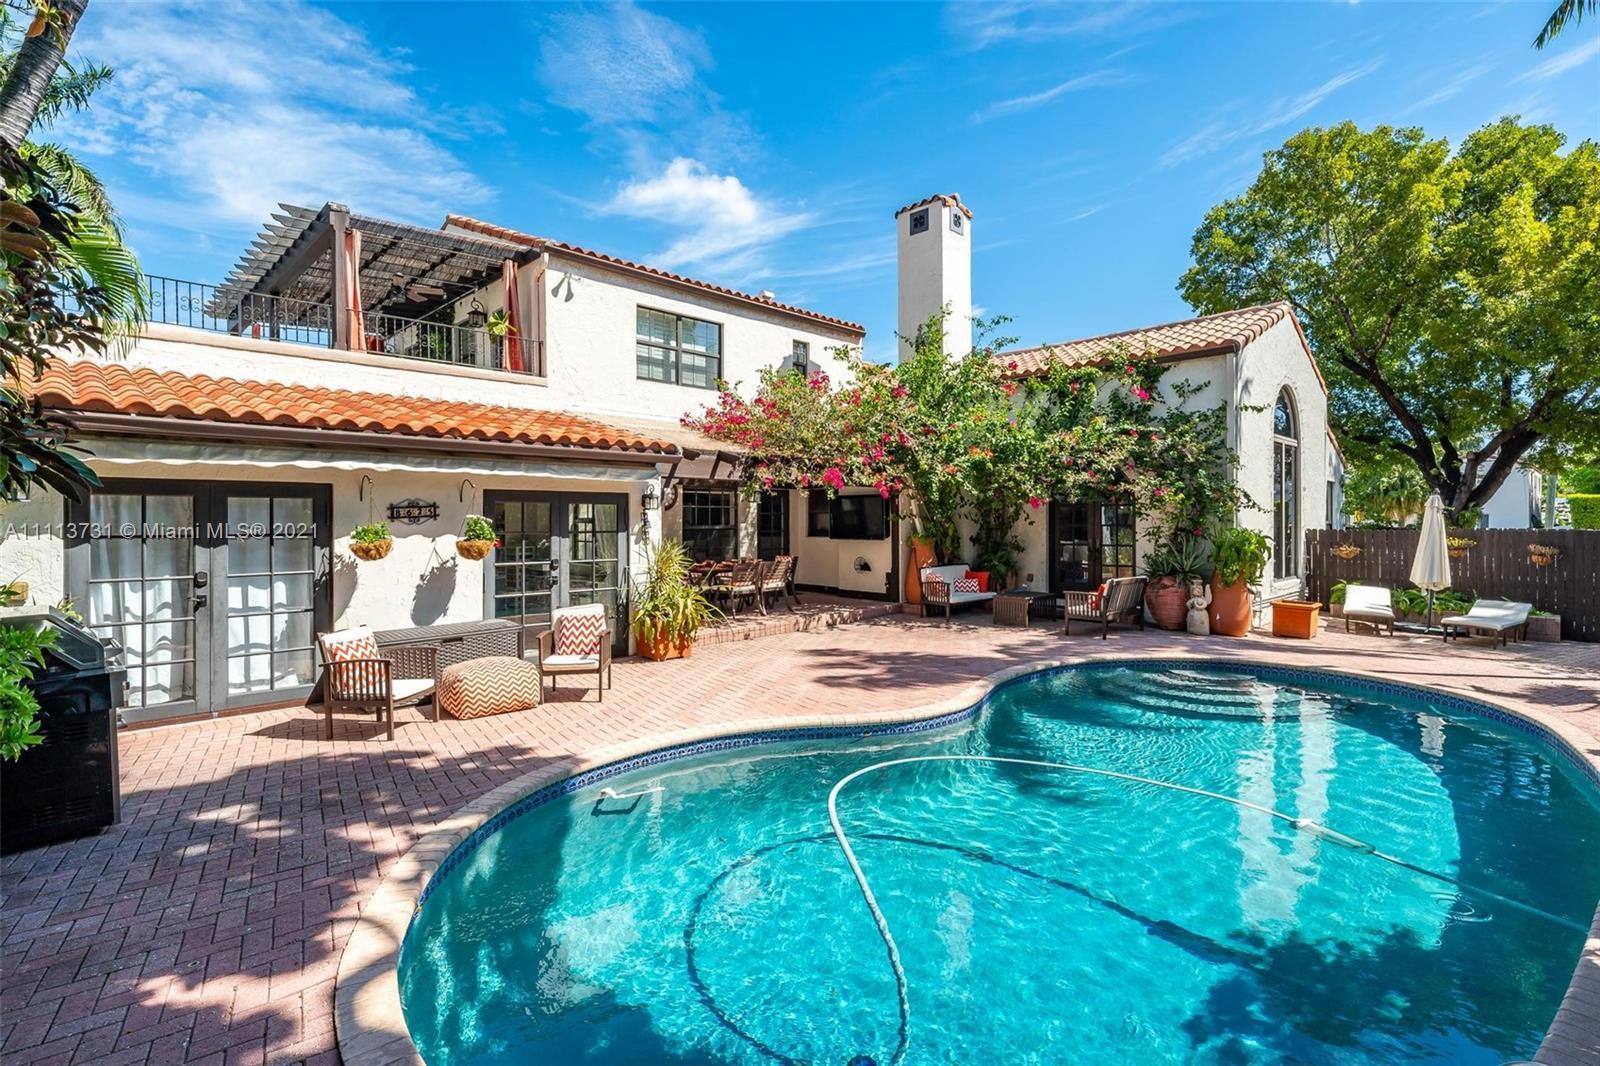 European elegance meets modern tropical living. Historic, exquisitely restored Mediterranean Revival